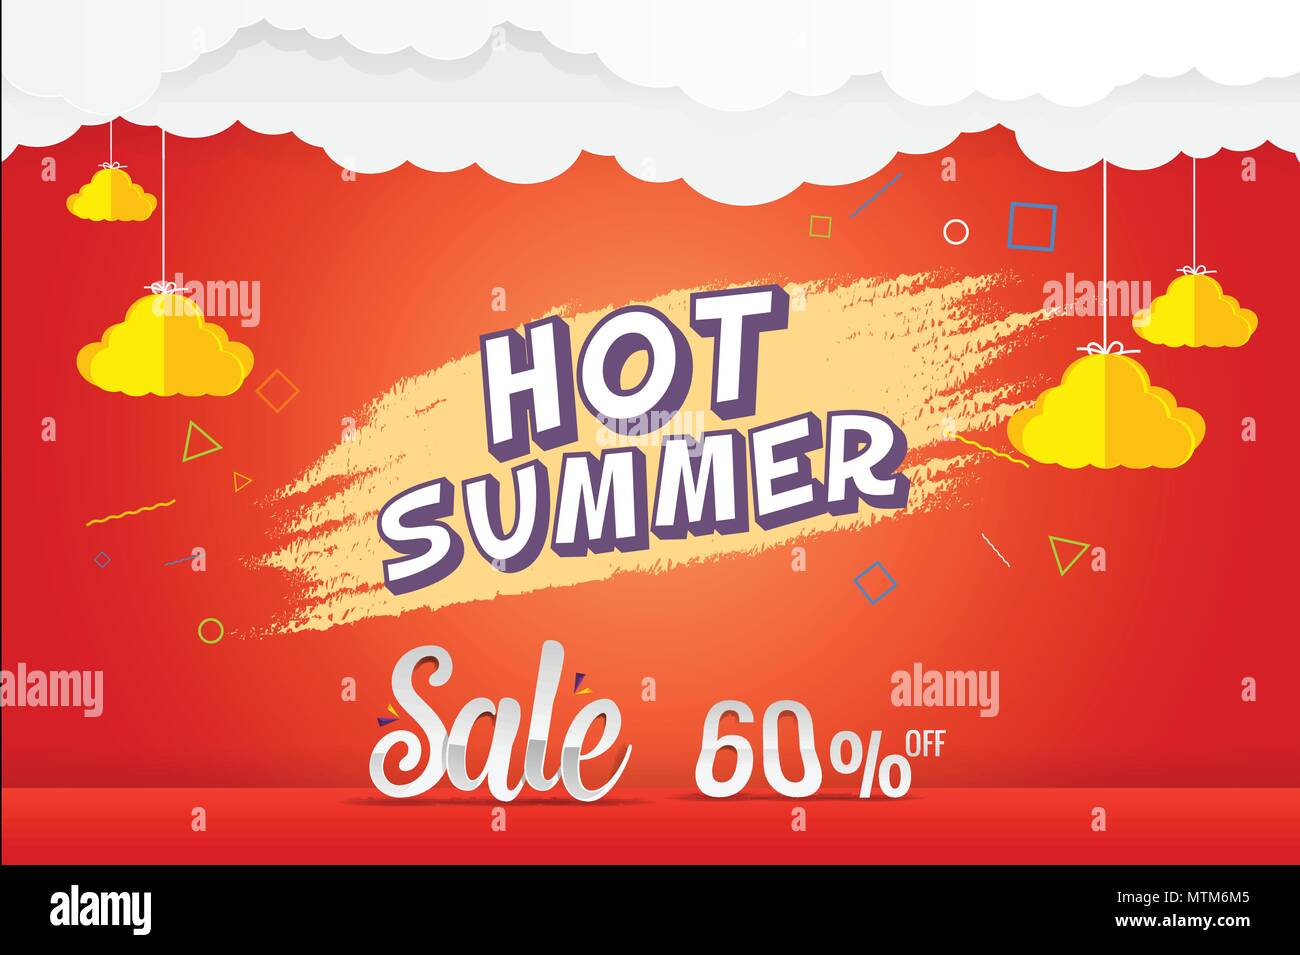 hot summer 60% sale discount vector template design - Stock Vector